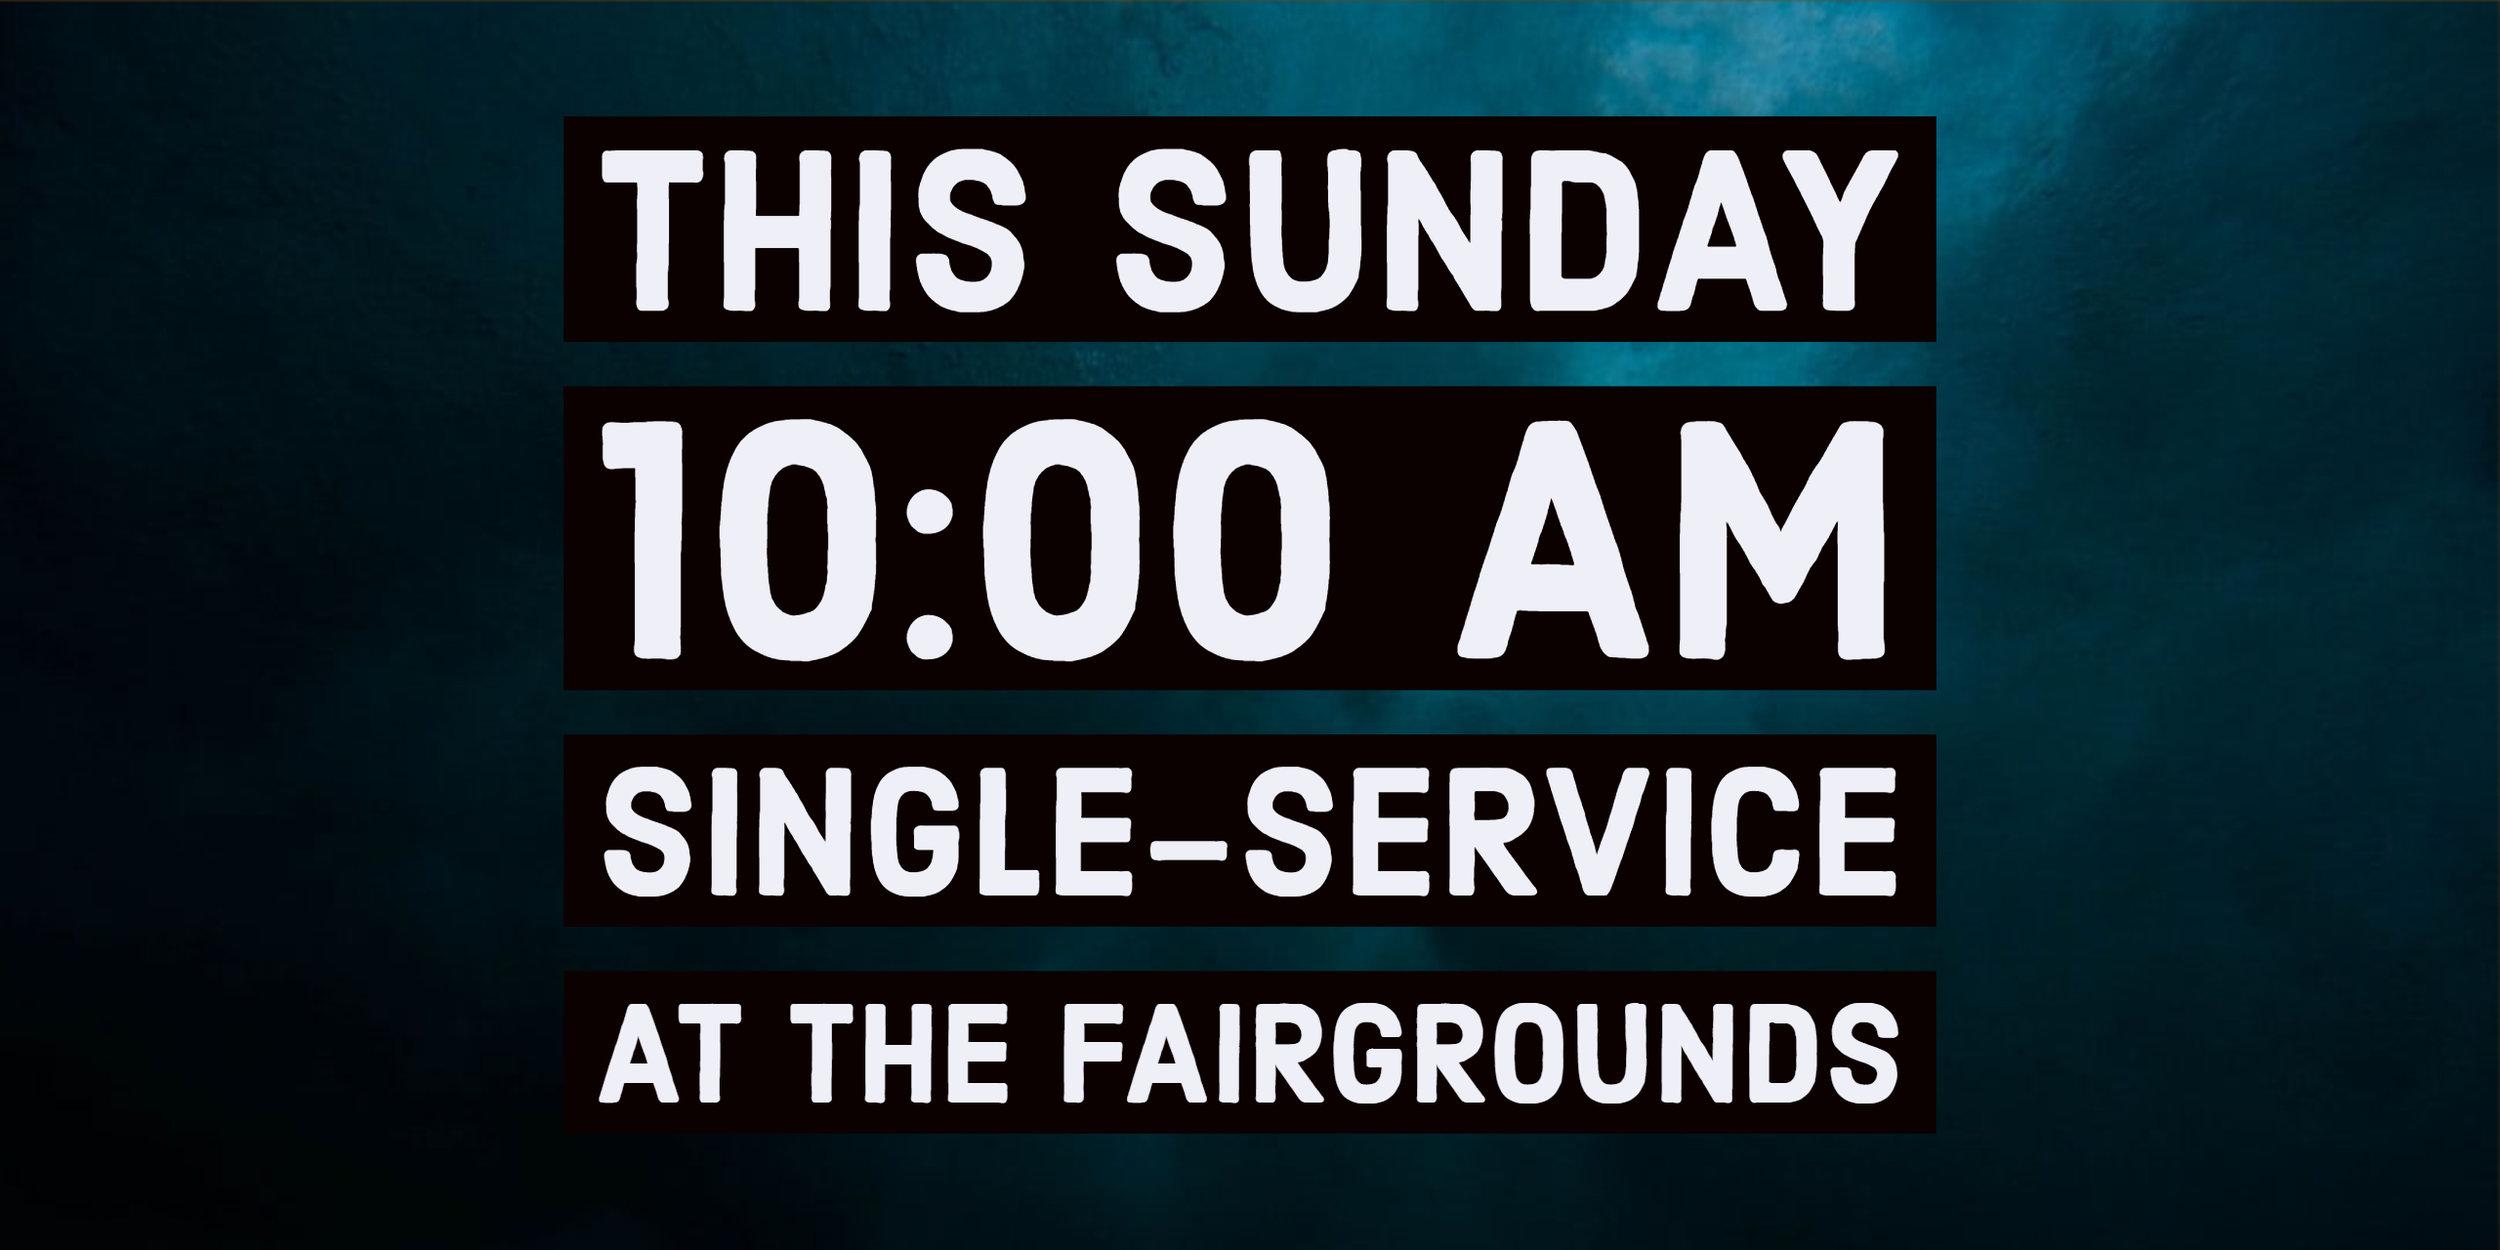 single service 10 am this sunday.jpg